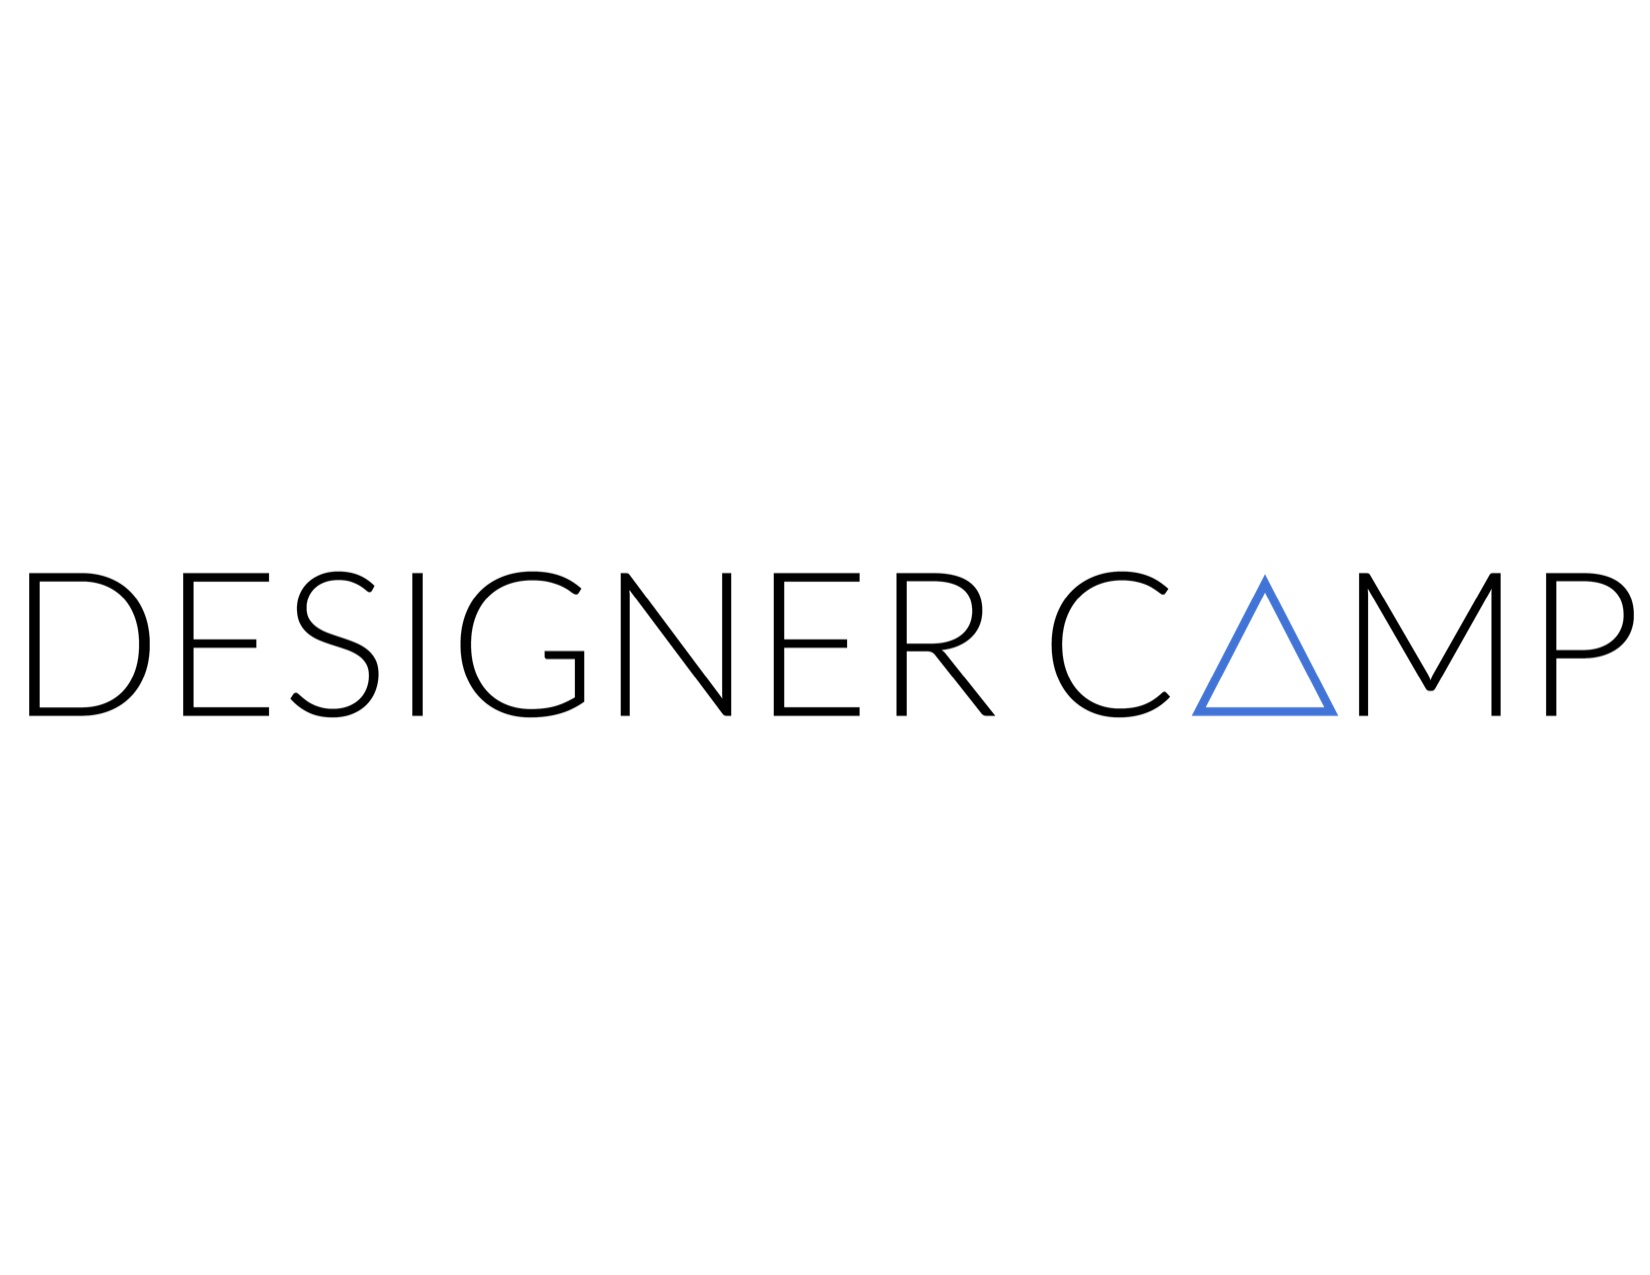 DESIGNER CAMPS logo